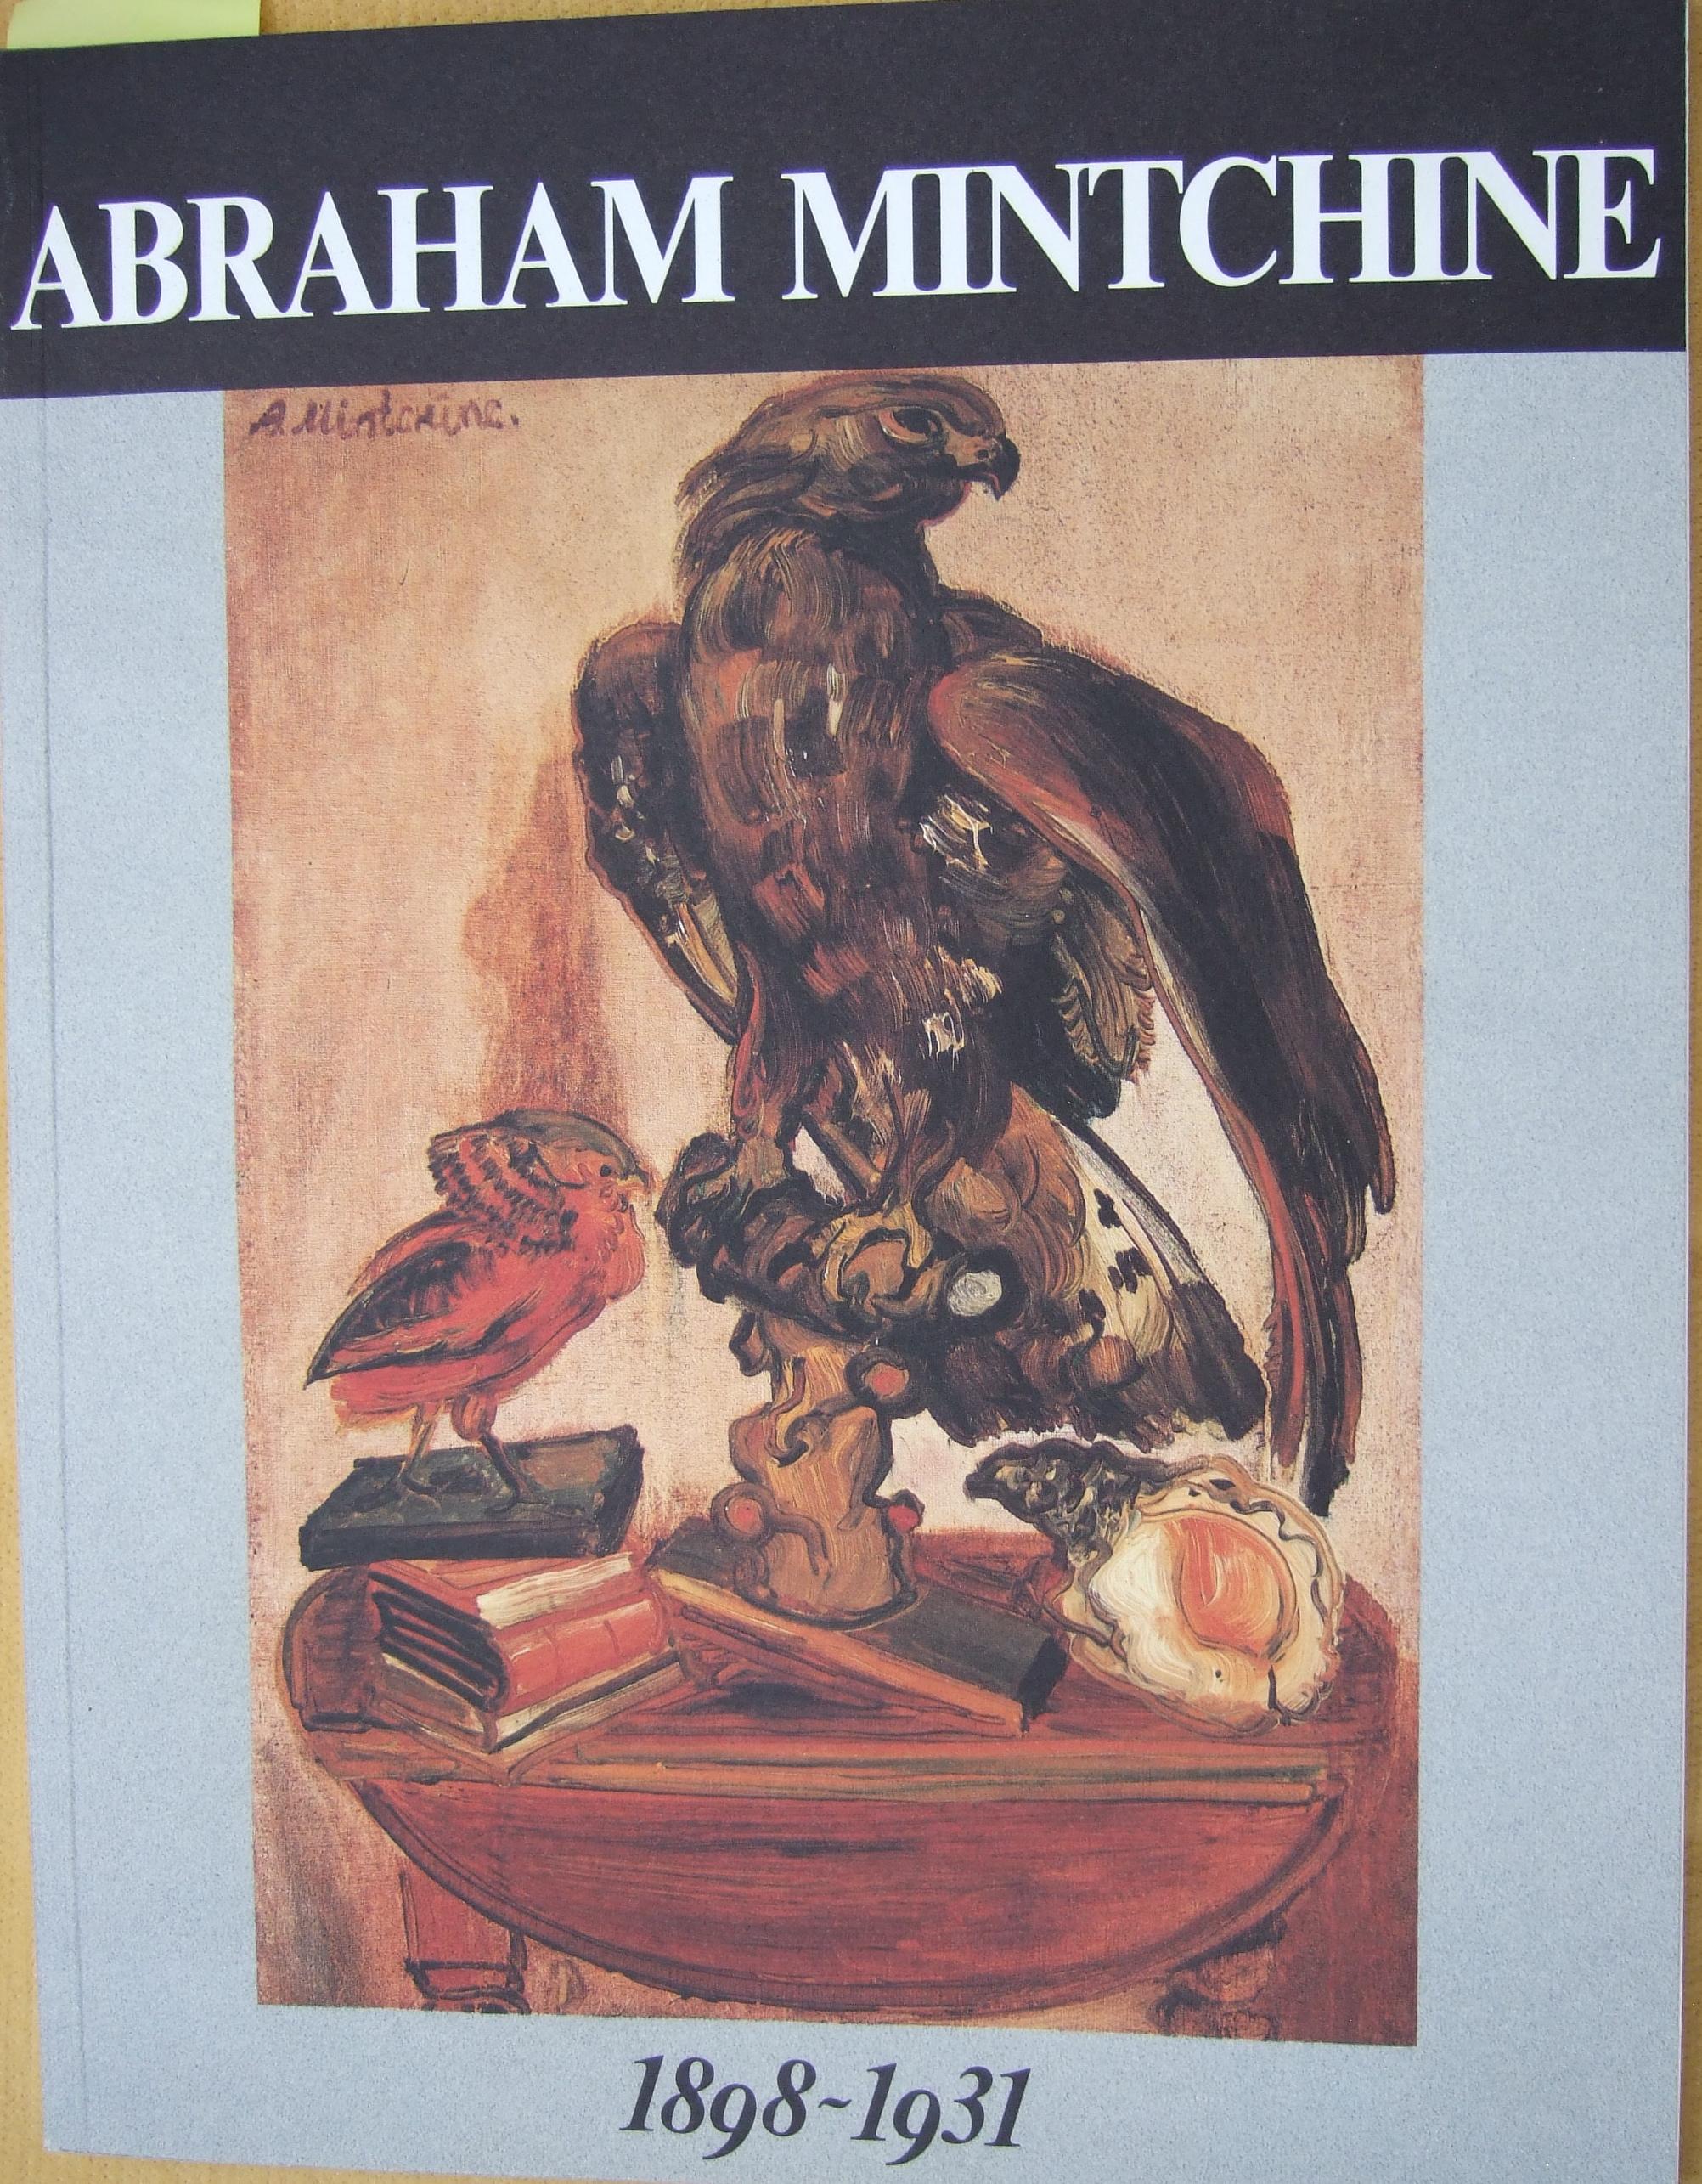 Abraham Mintchine by M. Di Veroli, 1989.